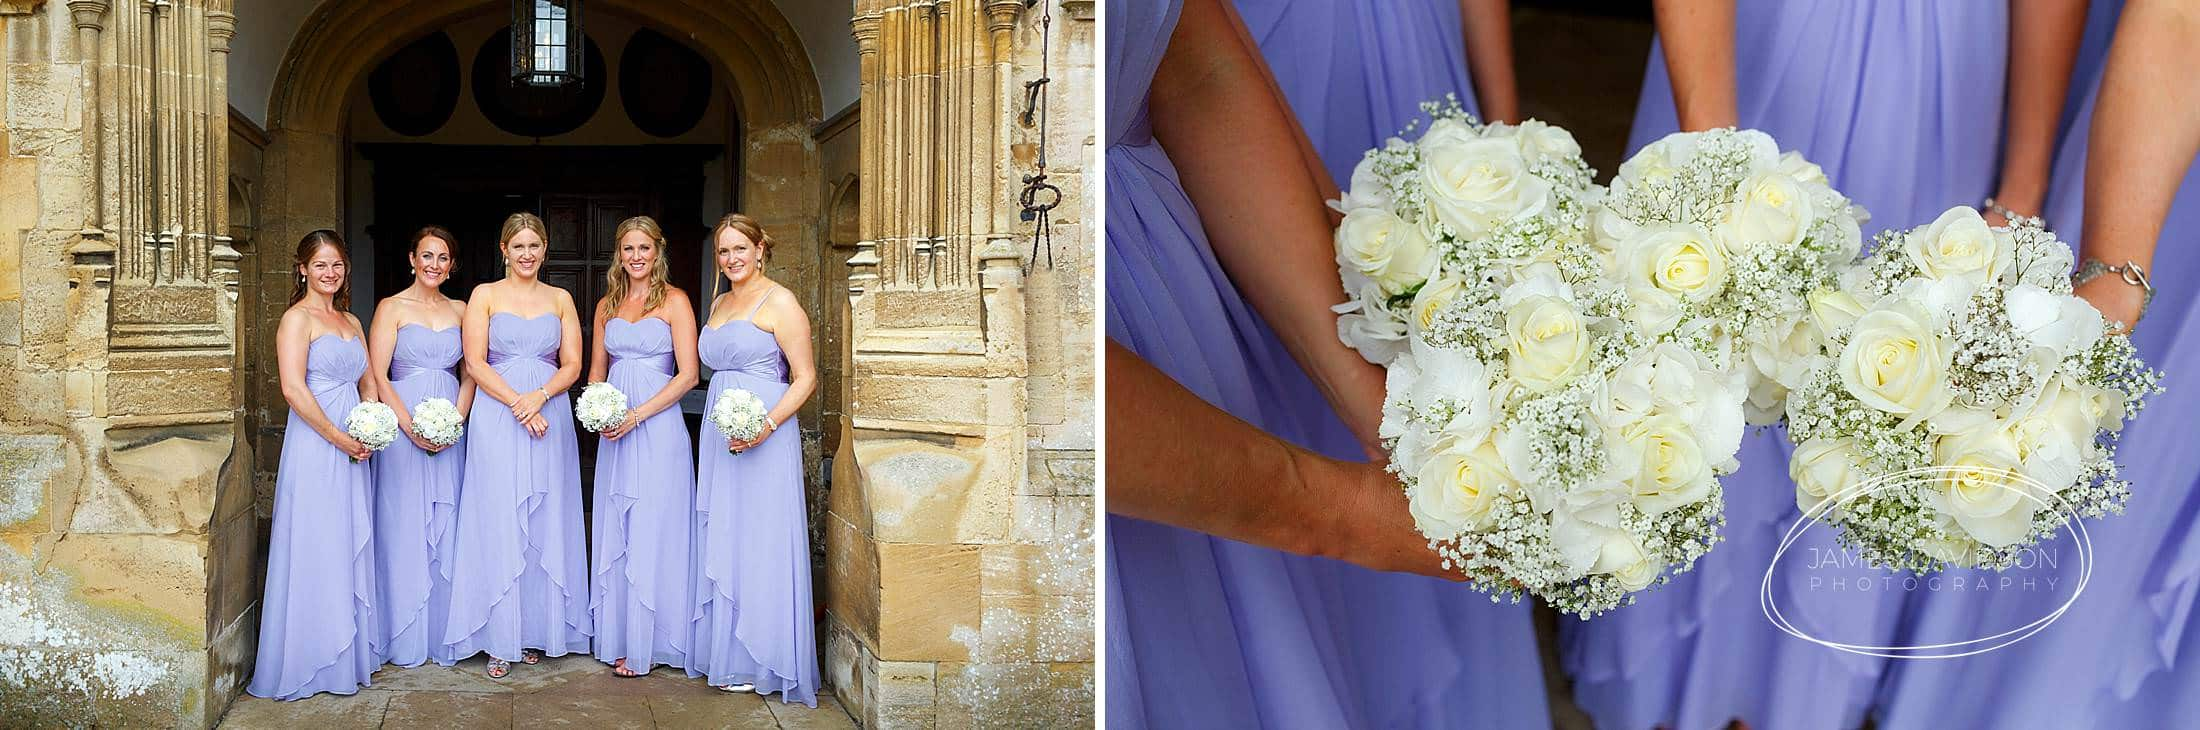 hengrave-hall-summer-wedding-035